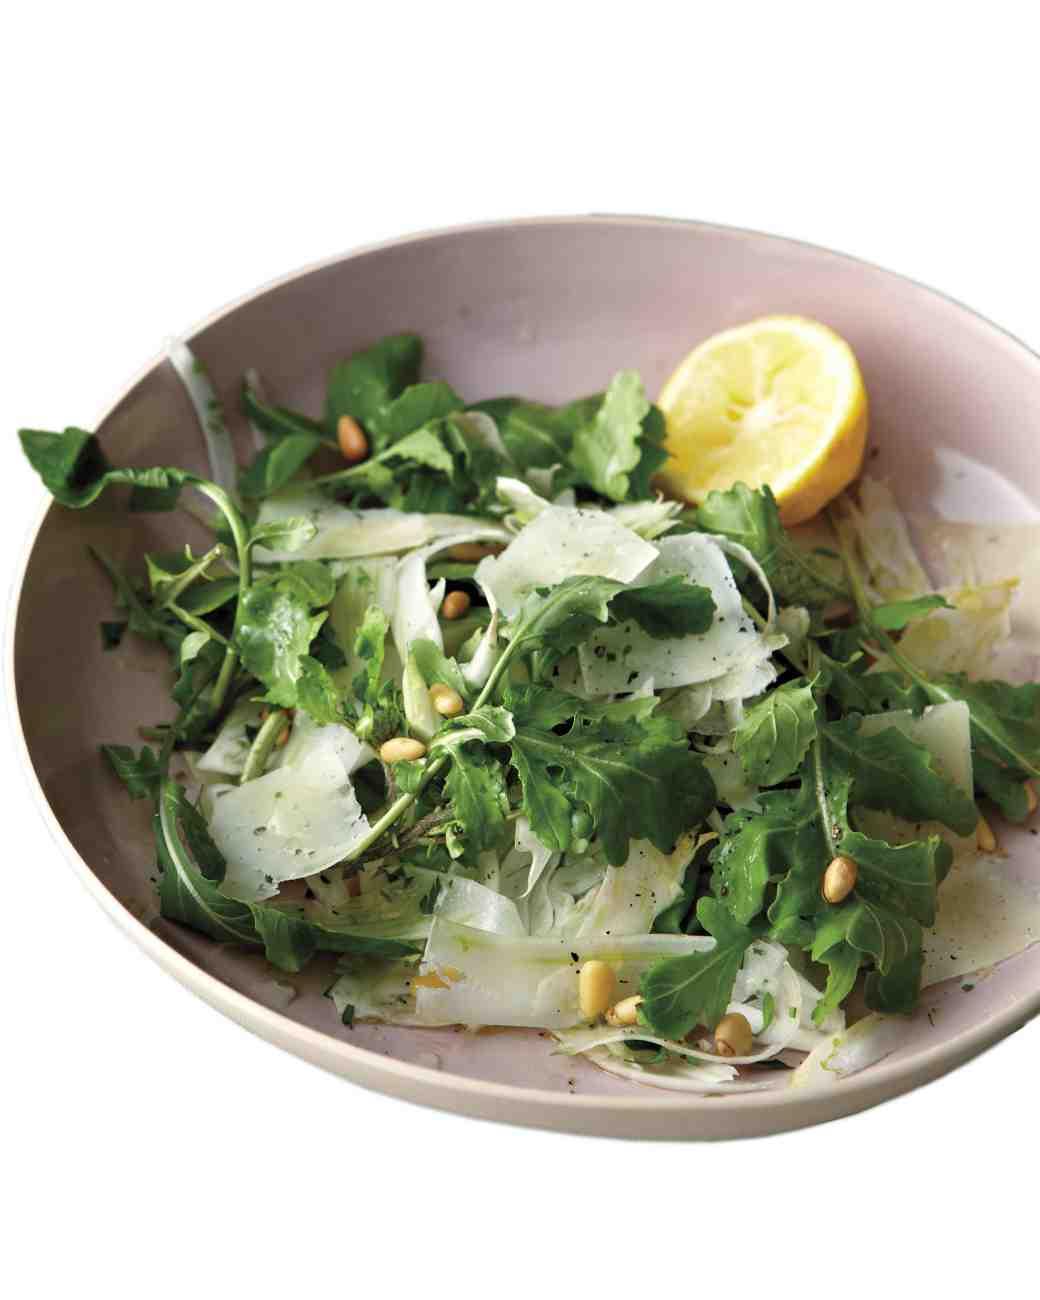 msl-salads-fennel-arugula-002-mld110134_vert.jpg